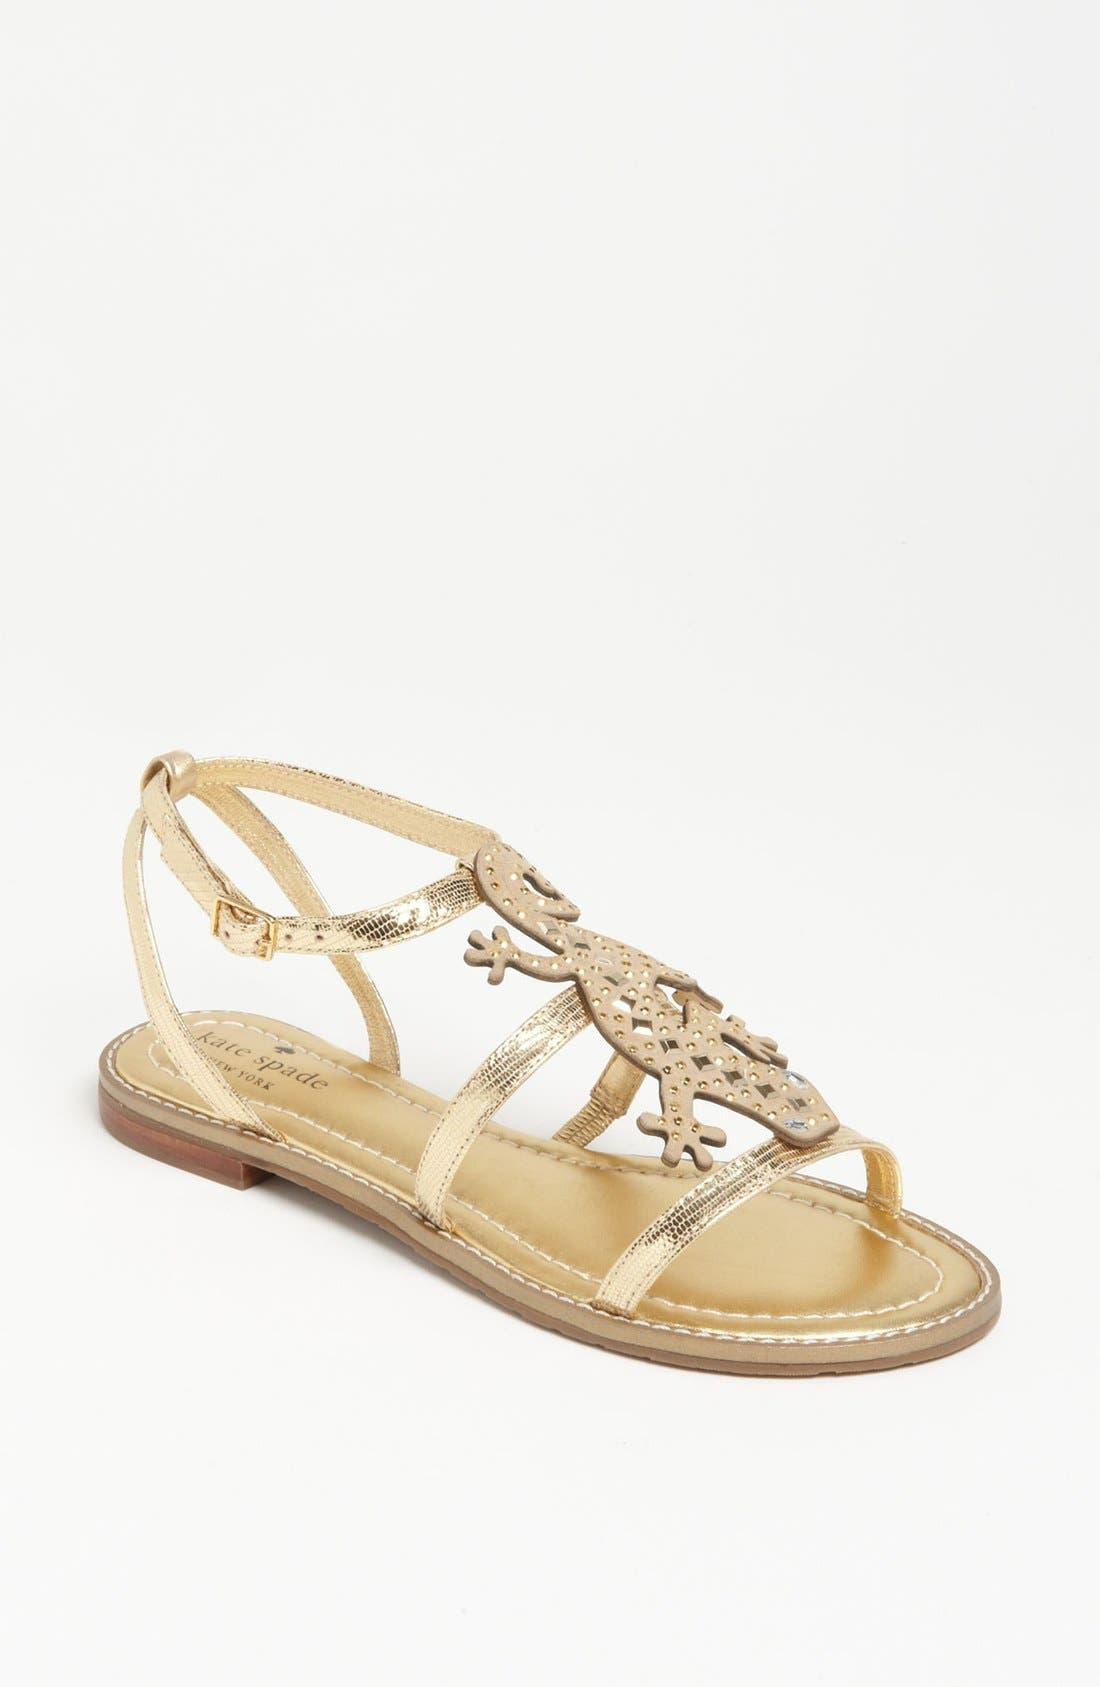 Main Image - kate spade new york 'slick' sandal